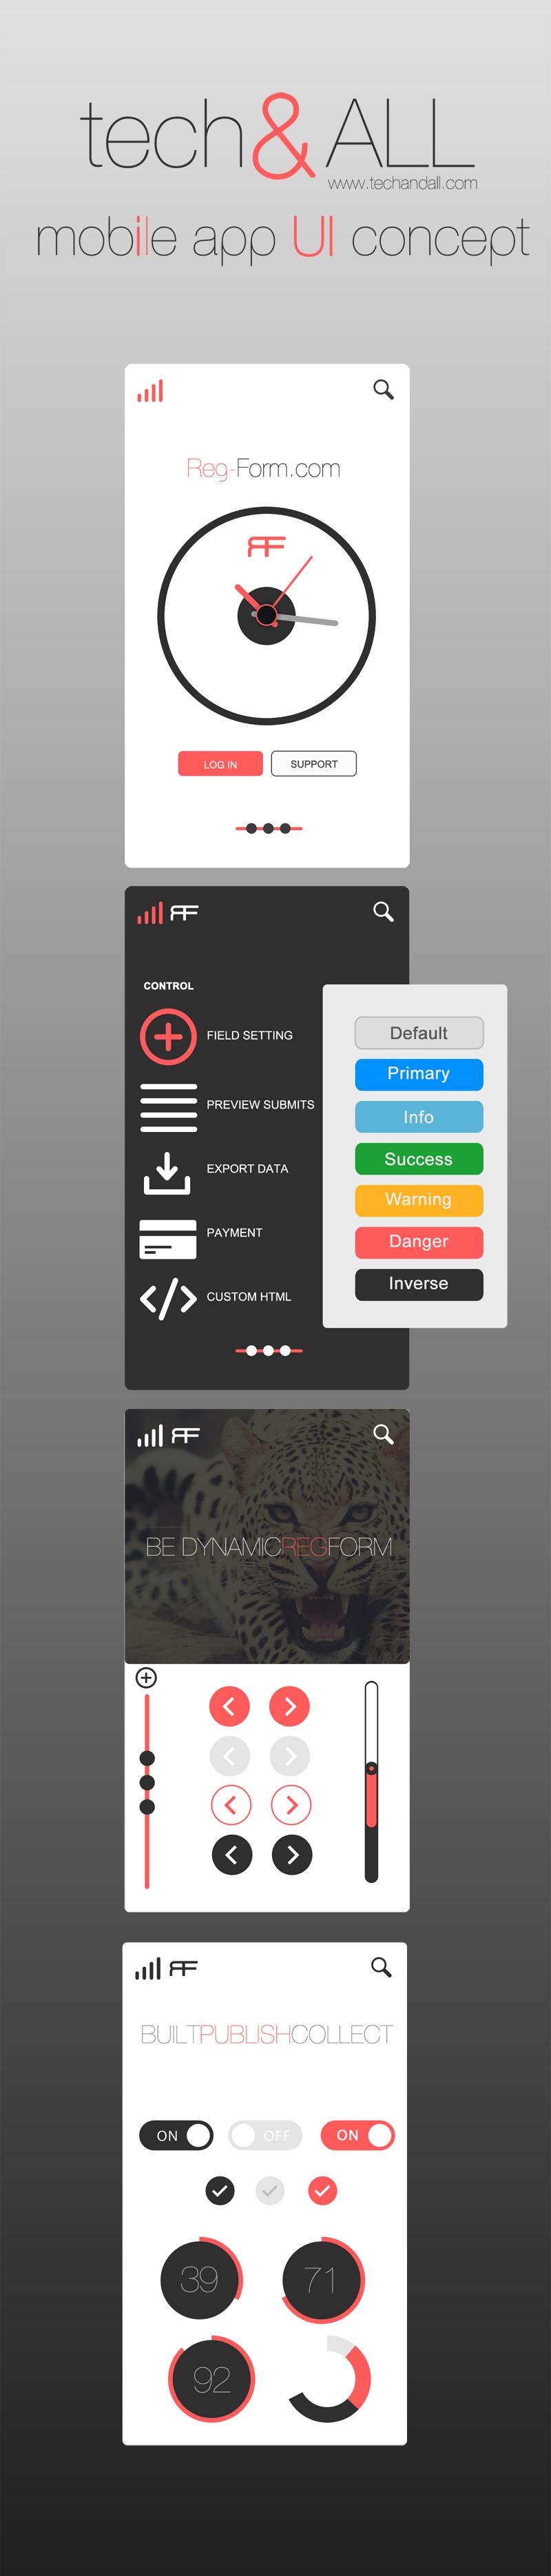 techandall_mobile_app_UI_concept_v4_green_L